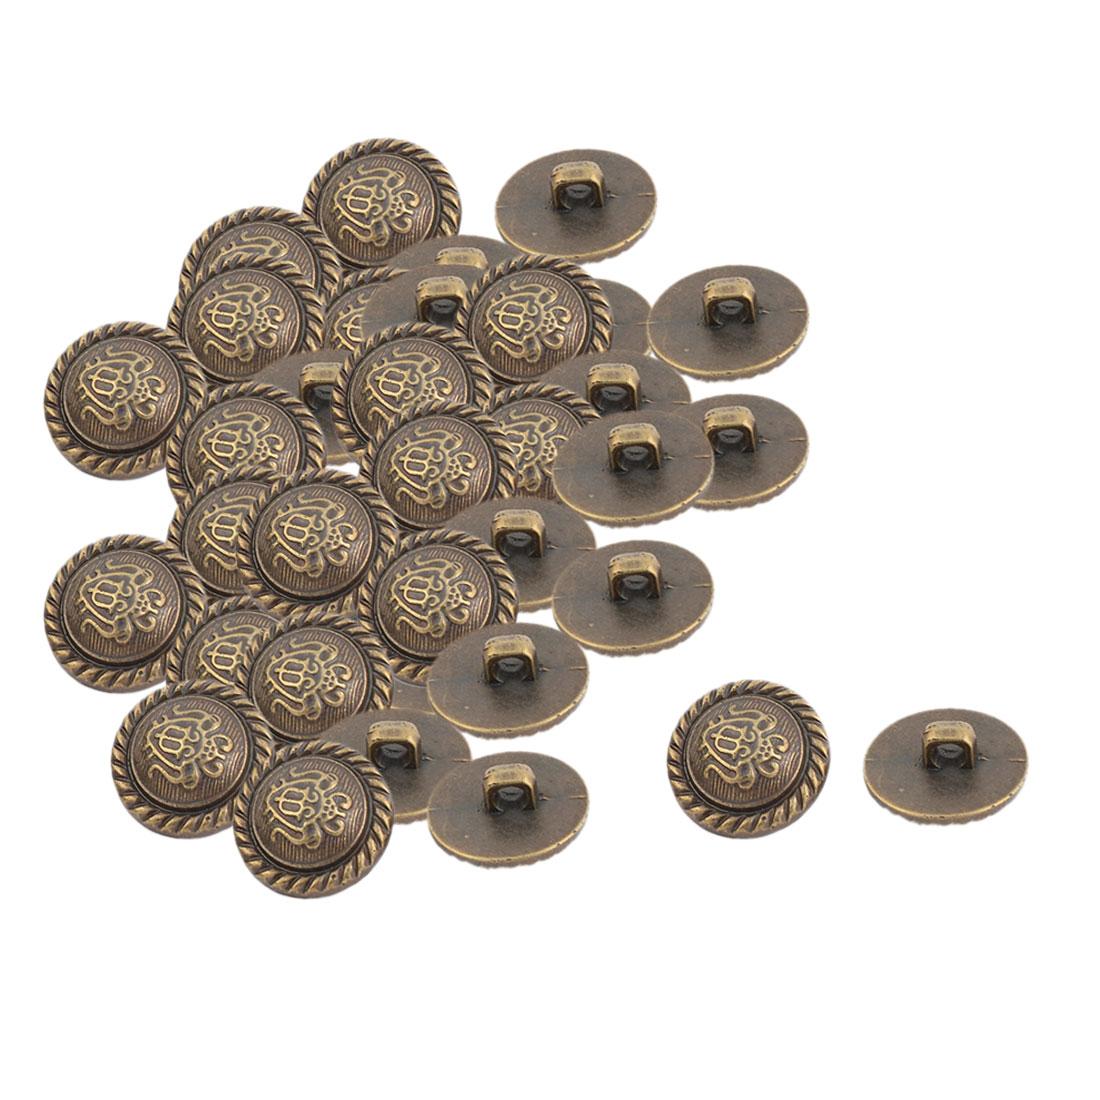 Home Plastic Insect Pattern DIY Decor Clothes Dress Buttons Bronze Tone 40 Pcs